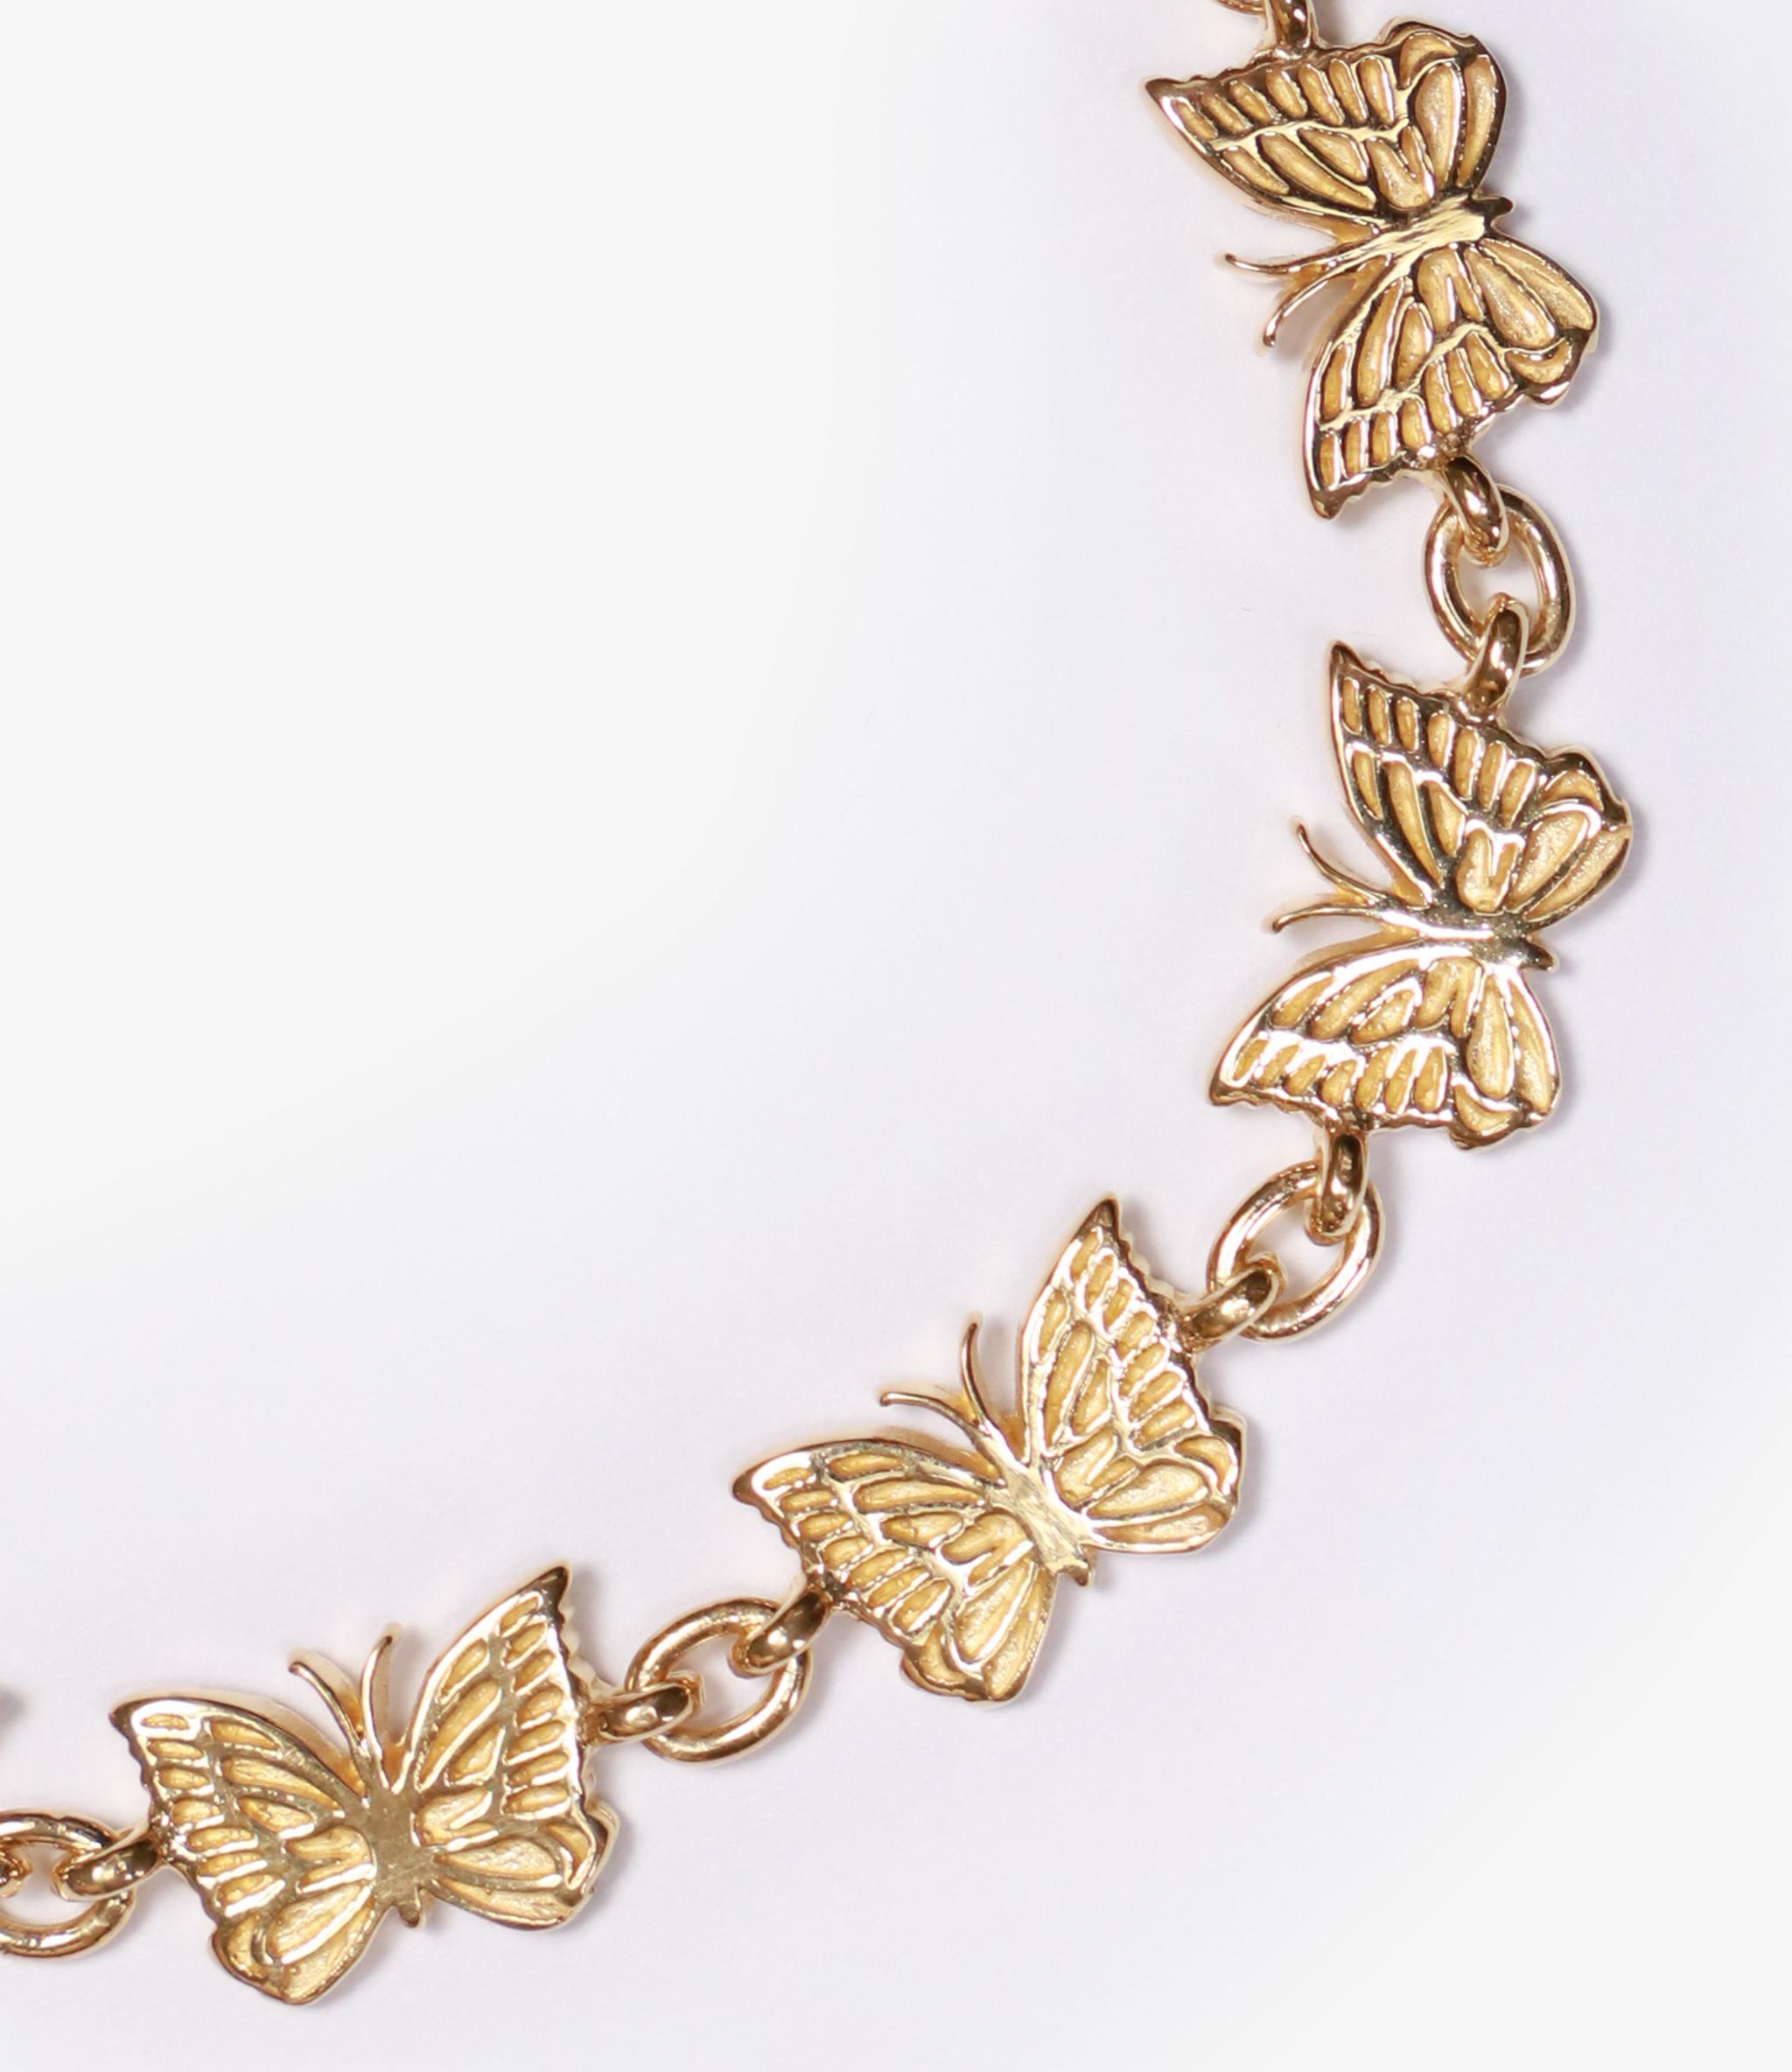 Needles Bracelet - Gold Plate - Papillon Medium